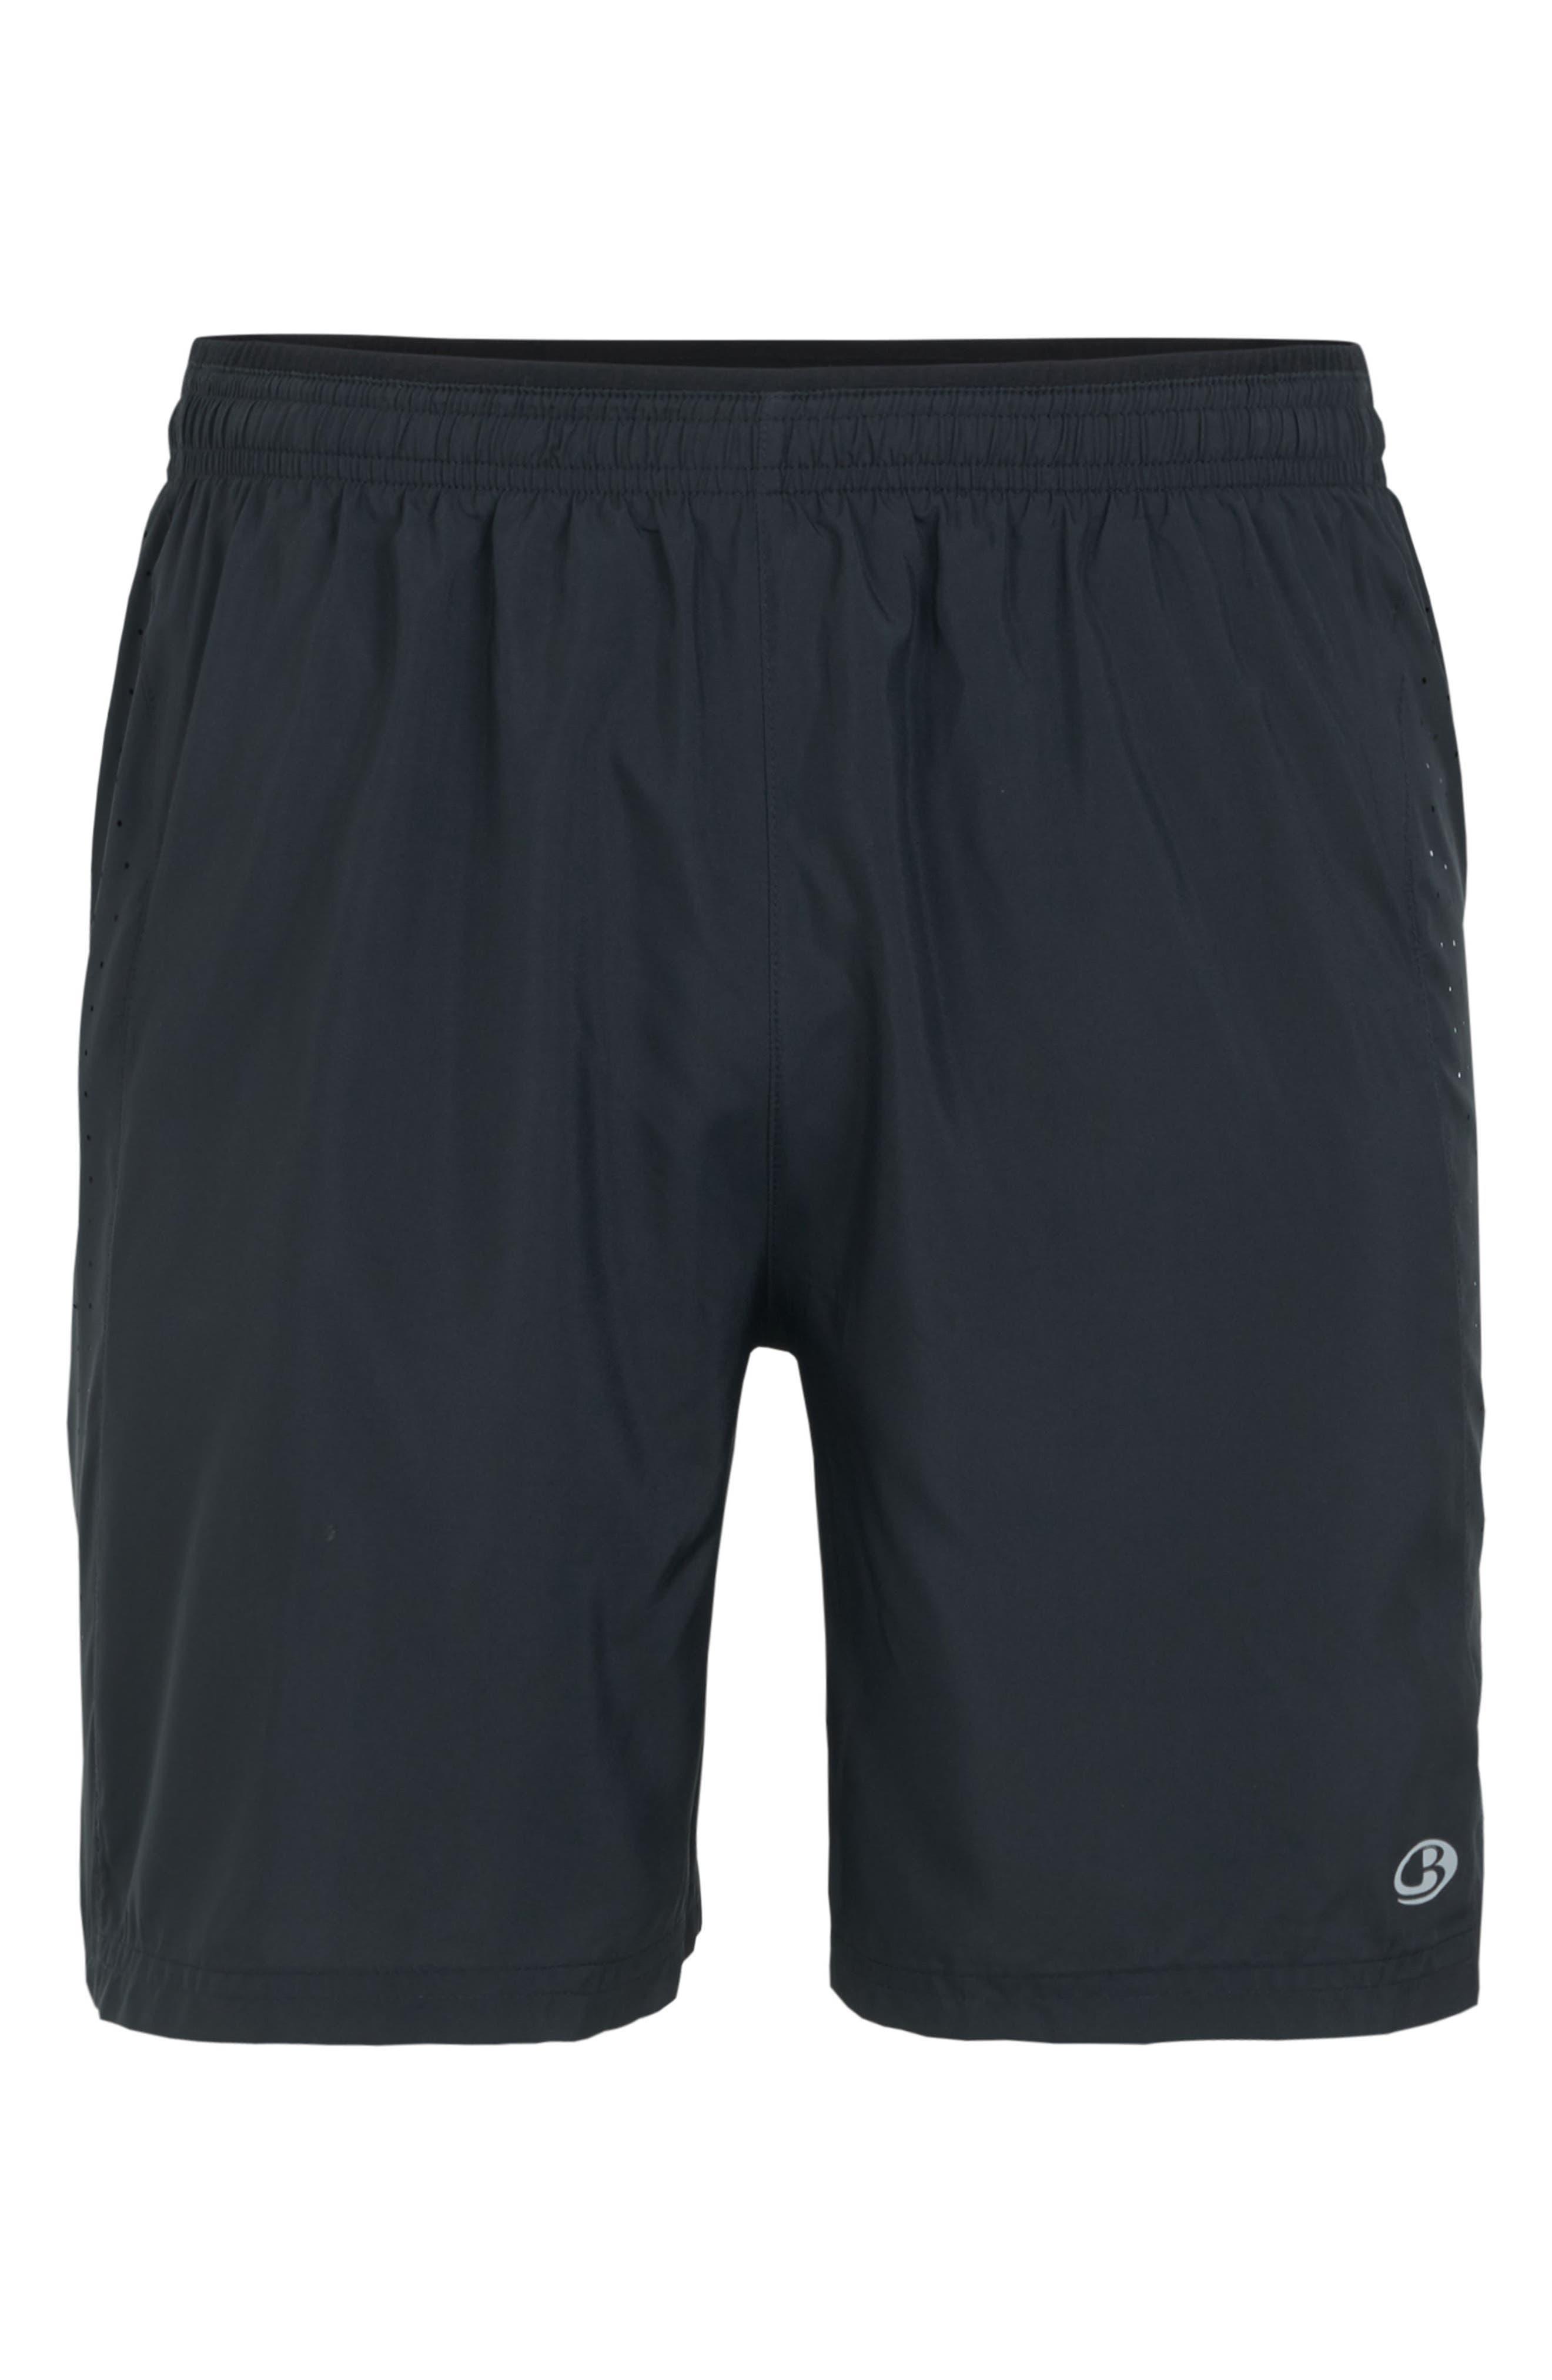 Strike Lite Shorts,                             Alternate thumbnail 6, color,                             BLACK